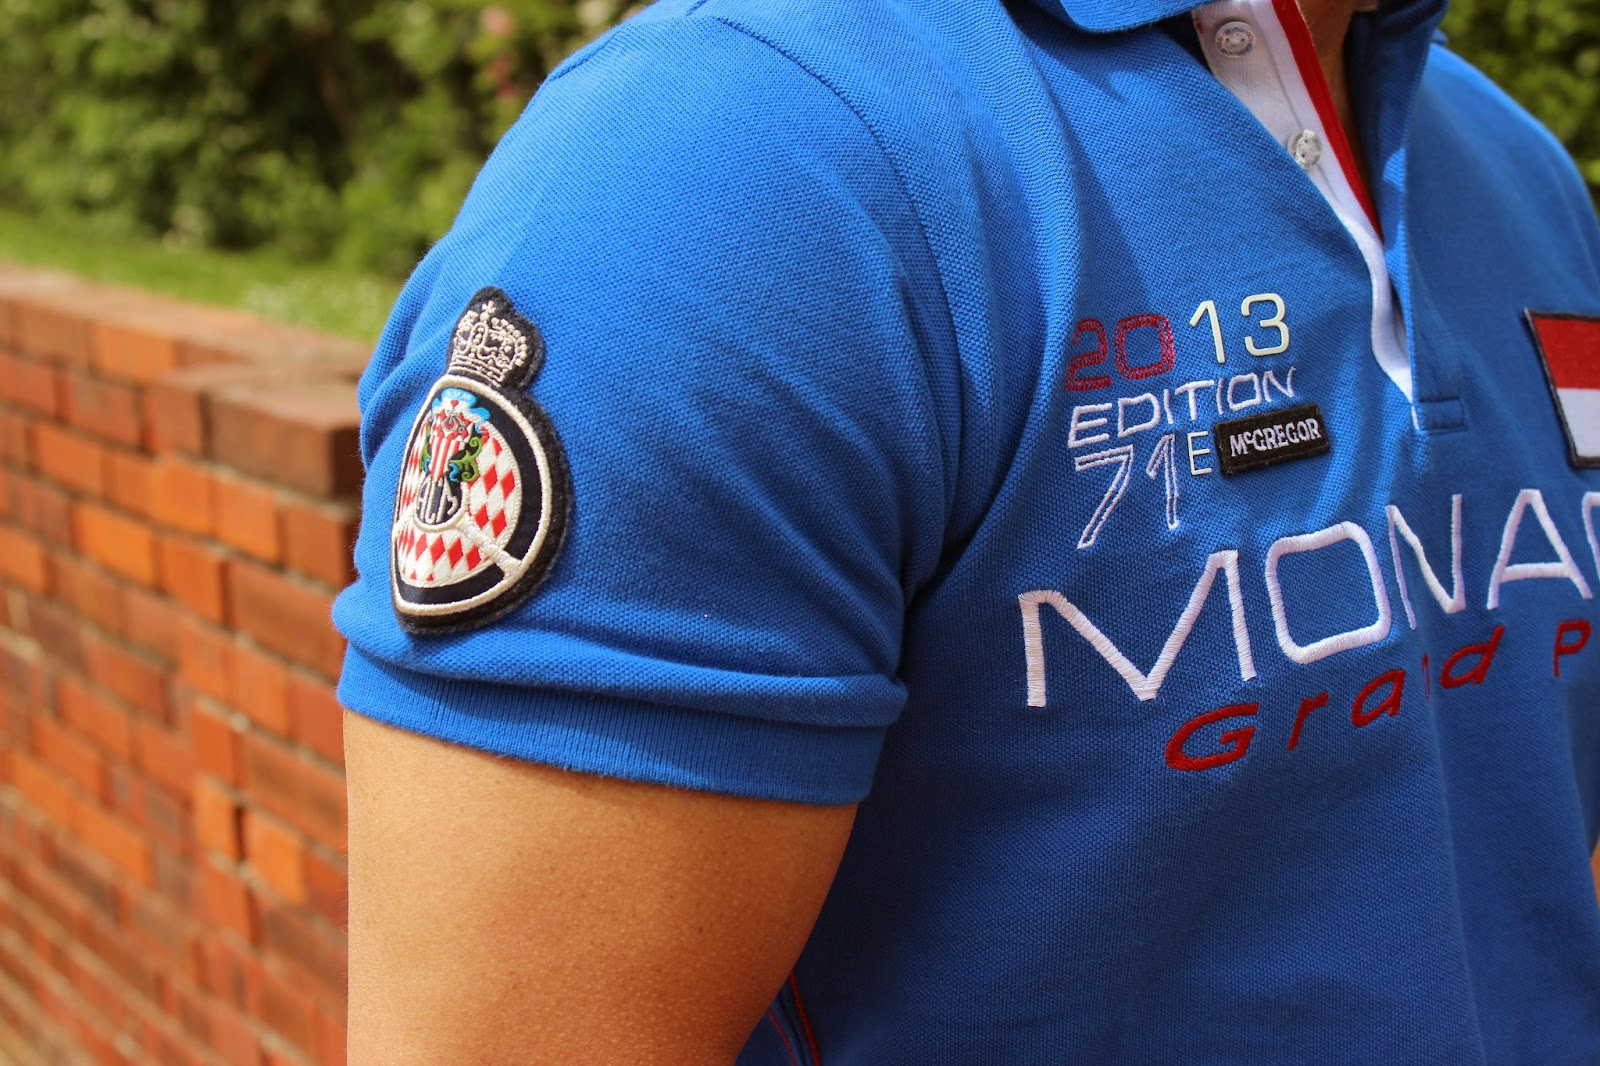 Grand Prix MONACO tenue Officielle MCGREGOR